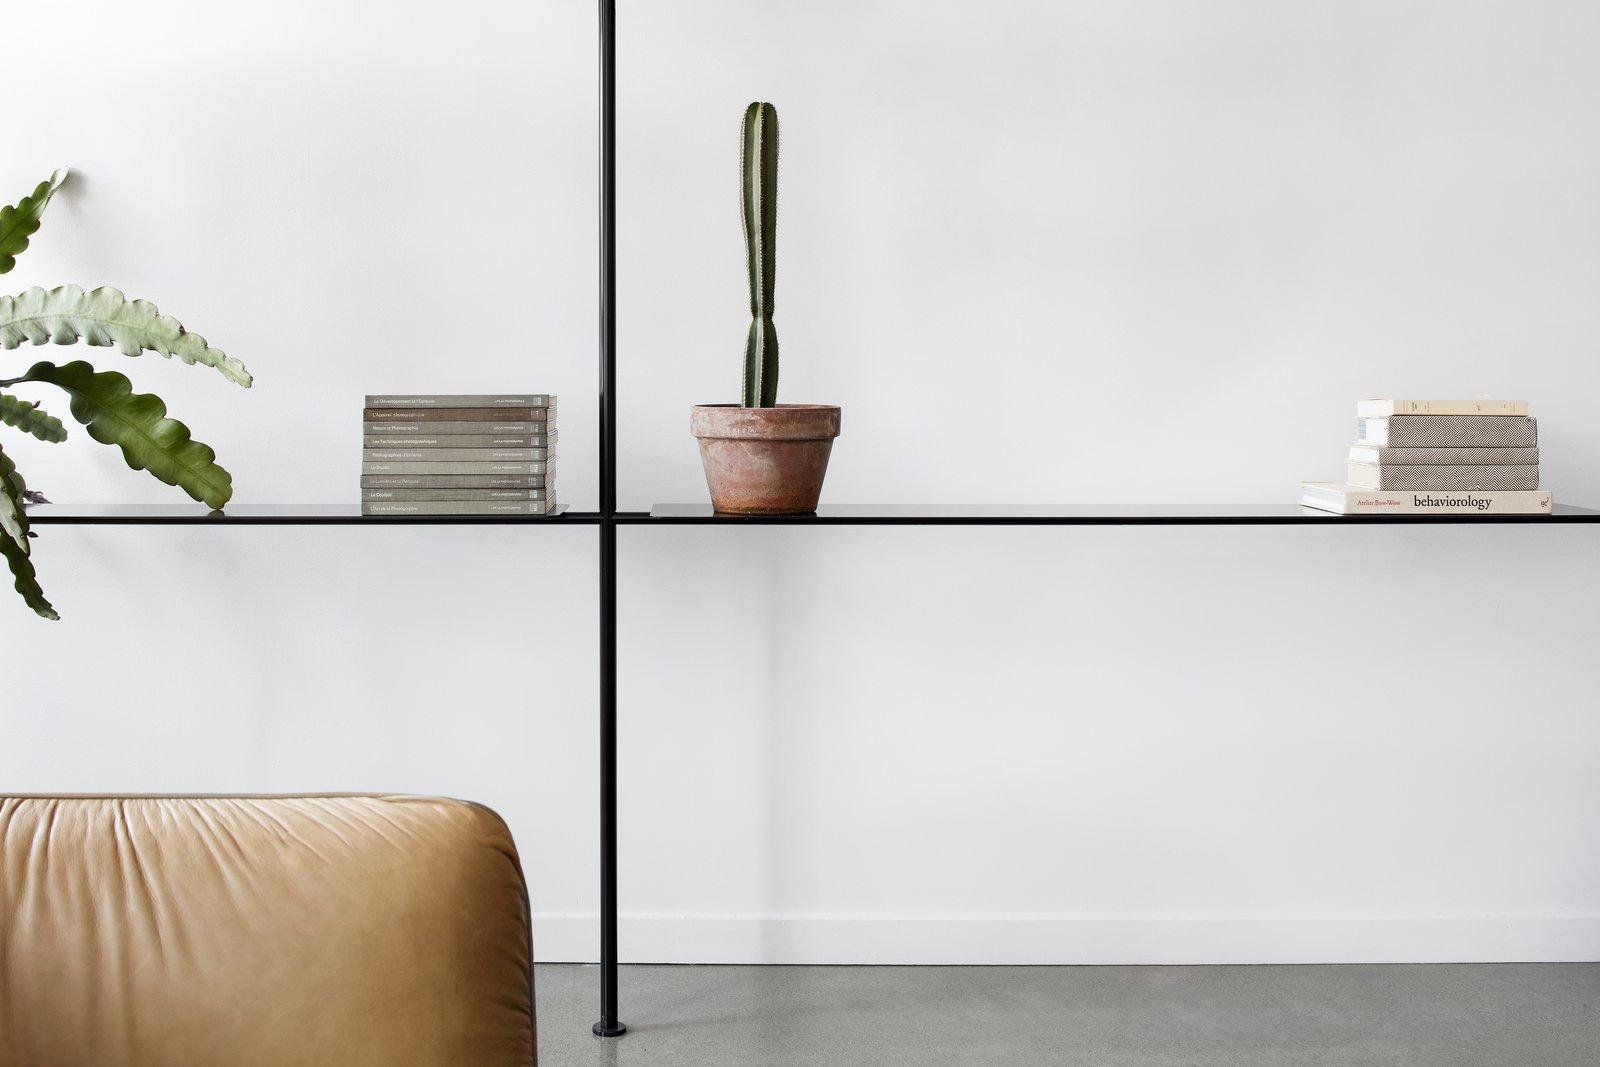 Living Room, Shelves, Sofa, Storage, Concrete Floor, and Bookcase  Saint-Laurent Apartment by Atelier Barda